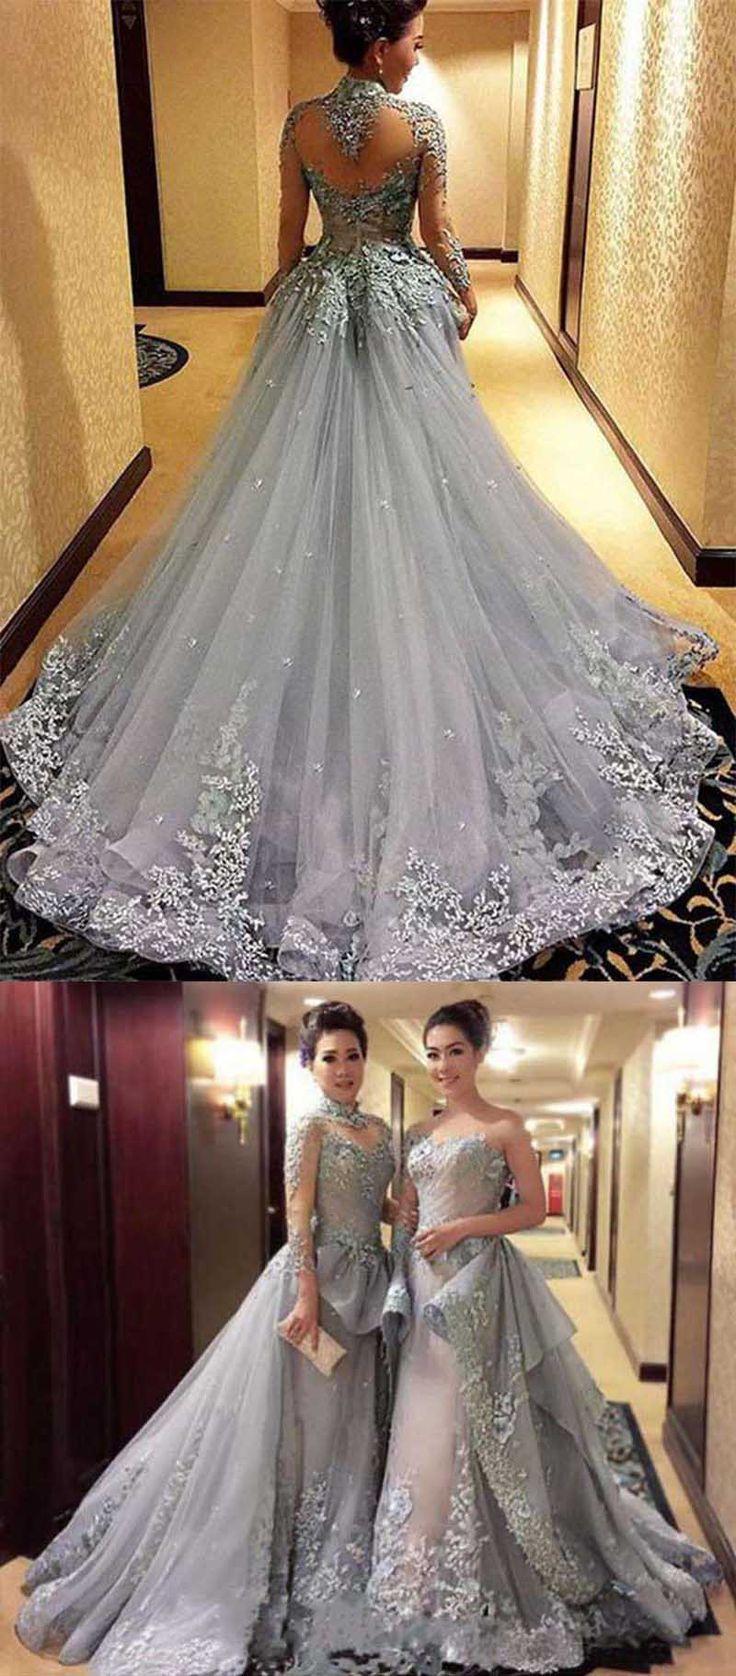 Wedding - Ball Gowns